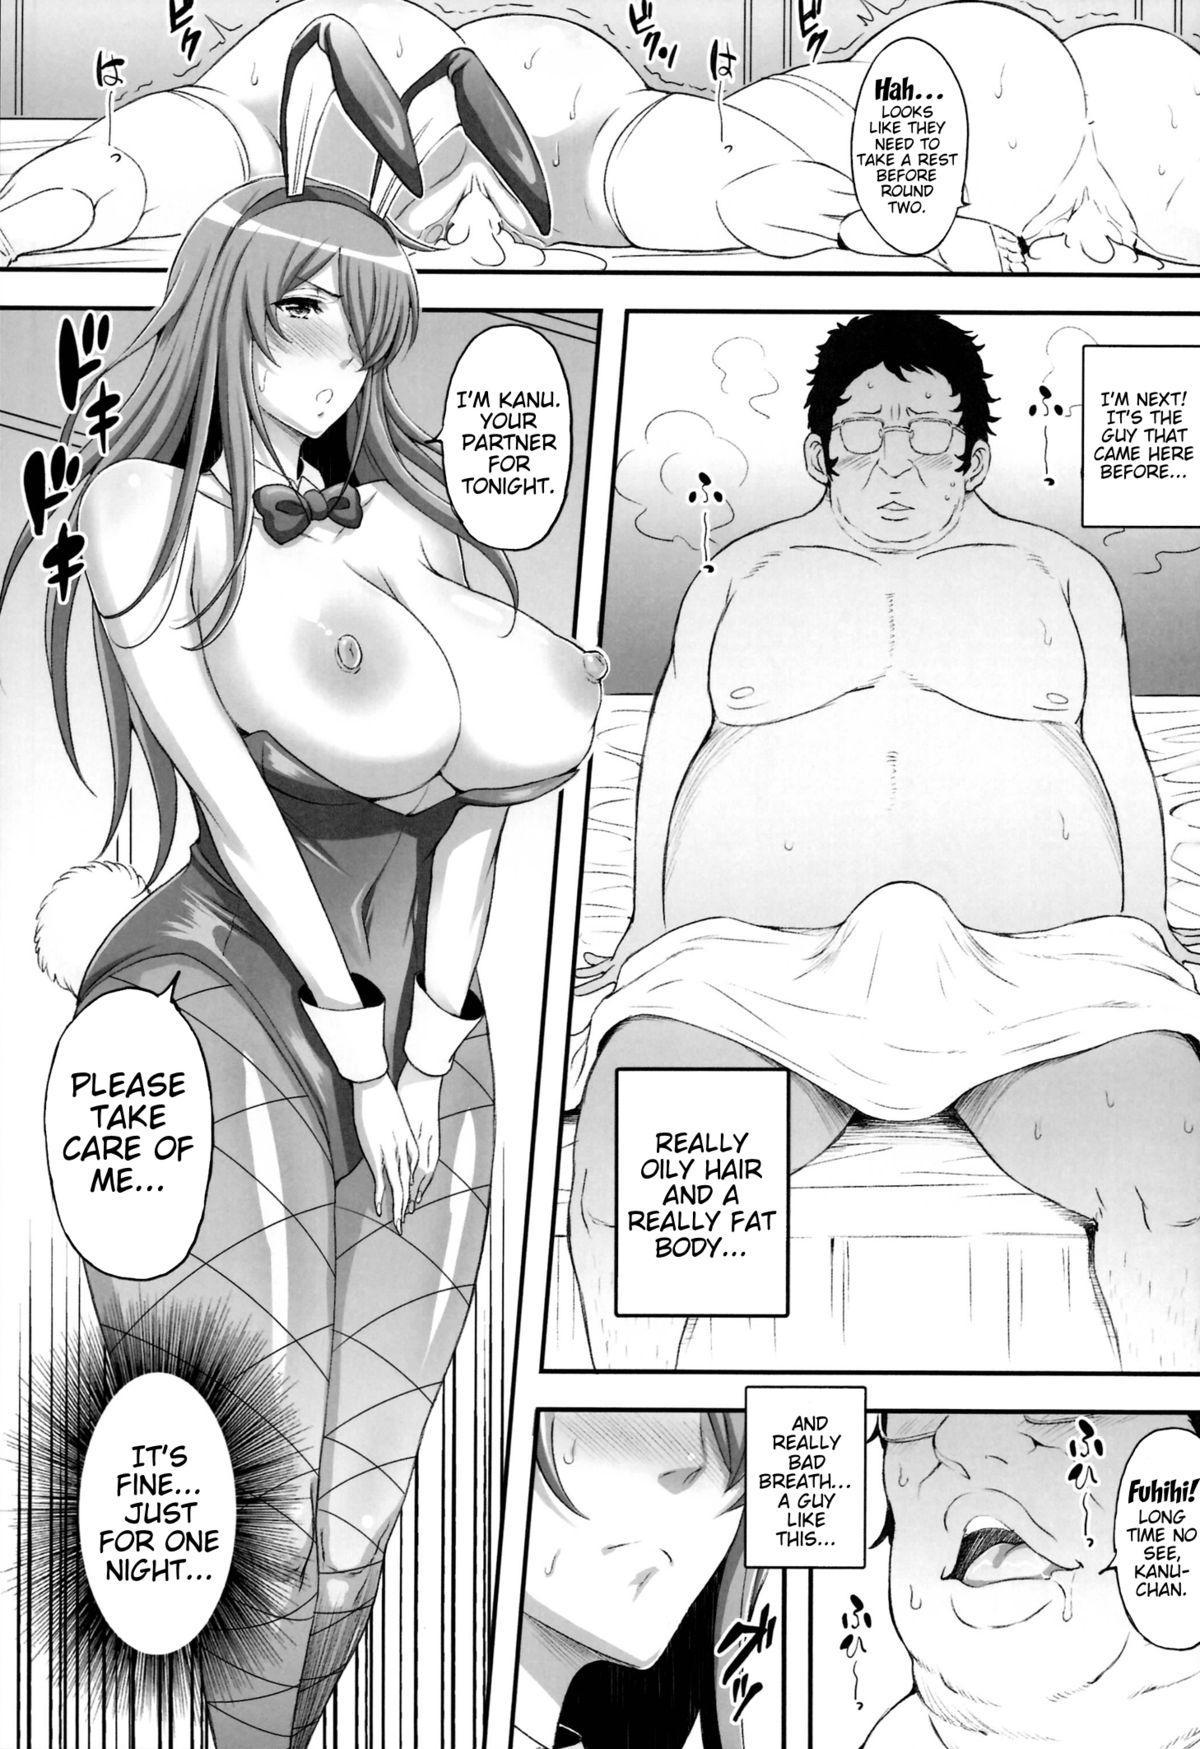 (C86) [Diogenes Club (Haikawa Hemlen)] Shokukan Mankan Zenseki Go Touki Ryoujoku   Shokukan Mankan Zenseki 5 - Princess Rape Battle- Cosplay Kanu (Ikkitousen) [English] {doujin-moe.us} 11